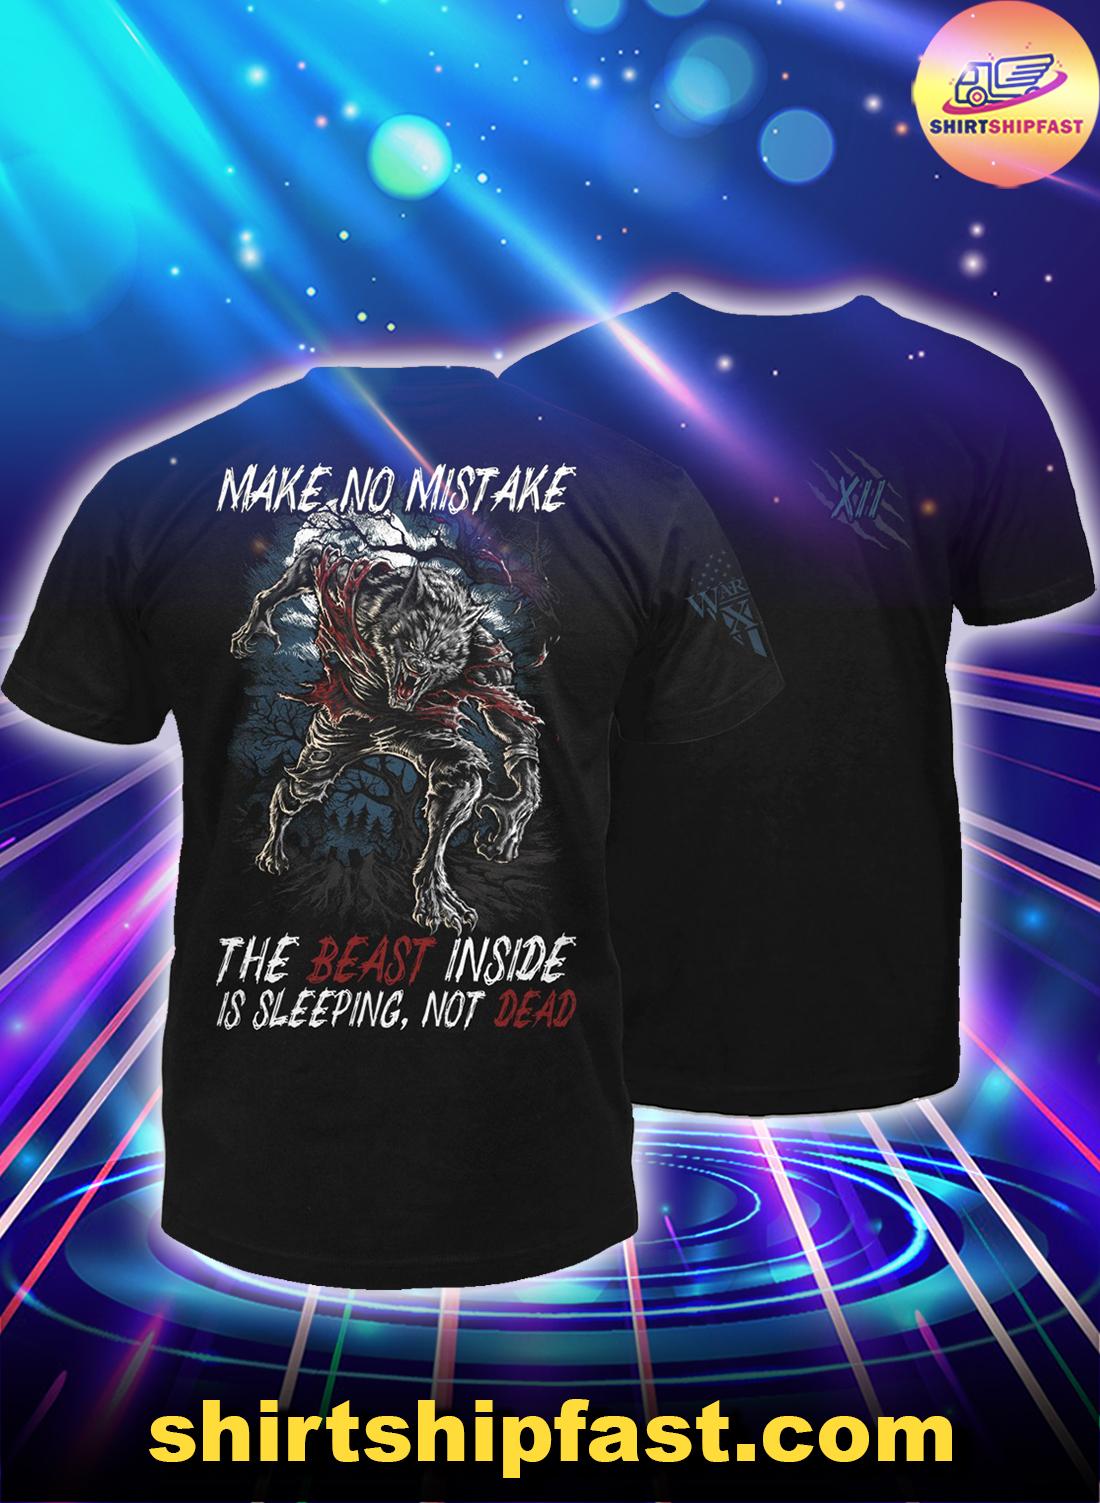 Make-no-mistake-the-beast-inside-is-sleeping-not-dead-shirt-1